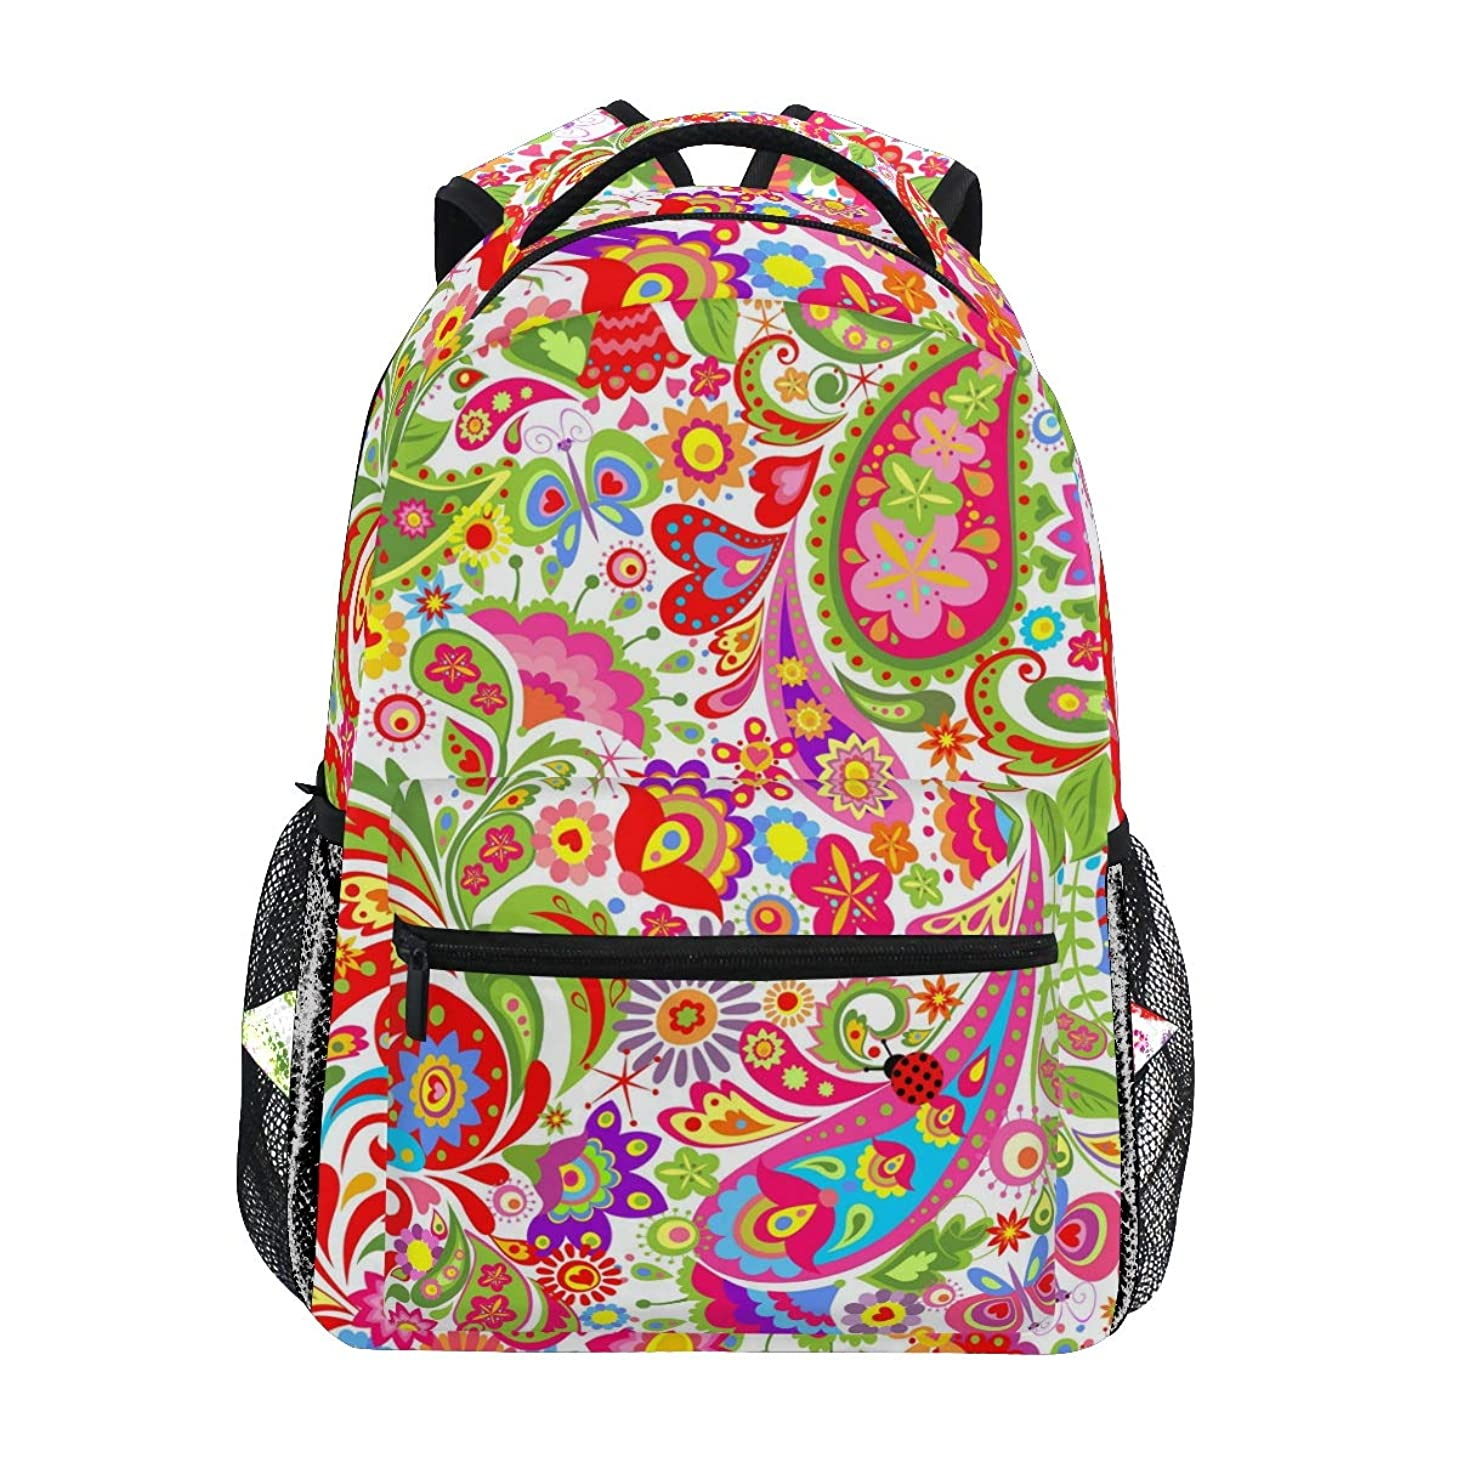 MAHU Backpack Spring Flower Leaves Paisley Adults School Bag Casual College Bag Travel Zipper Bookbag Hiking Shoulder Daypack for Women Men